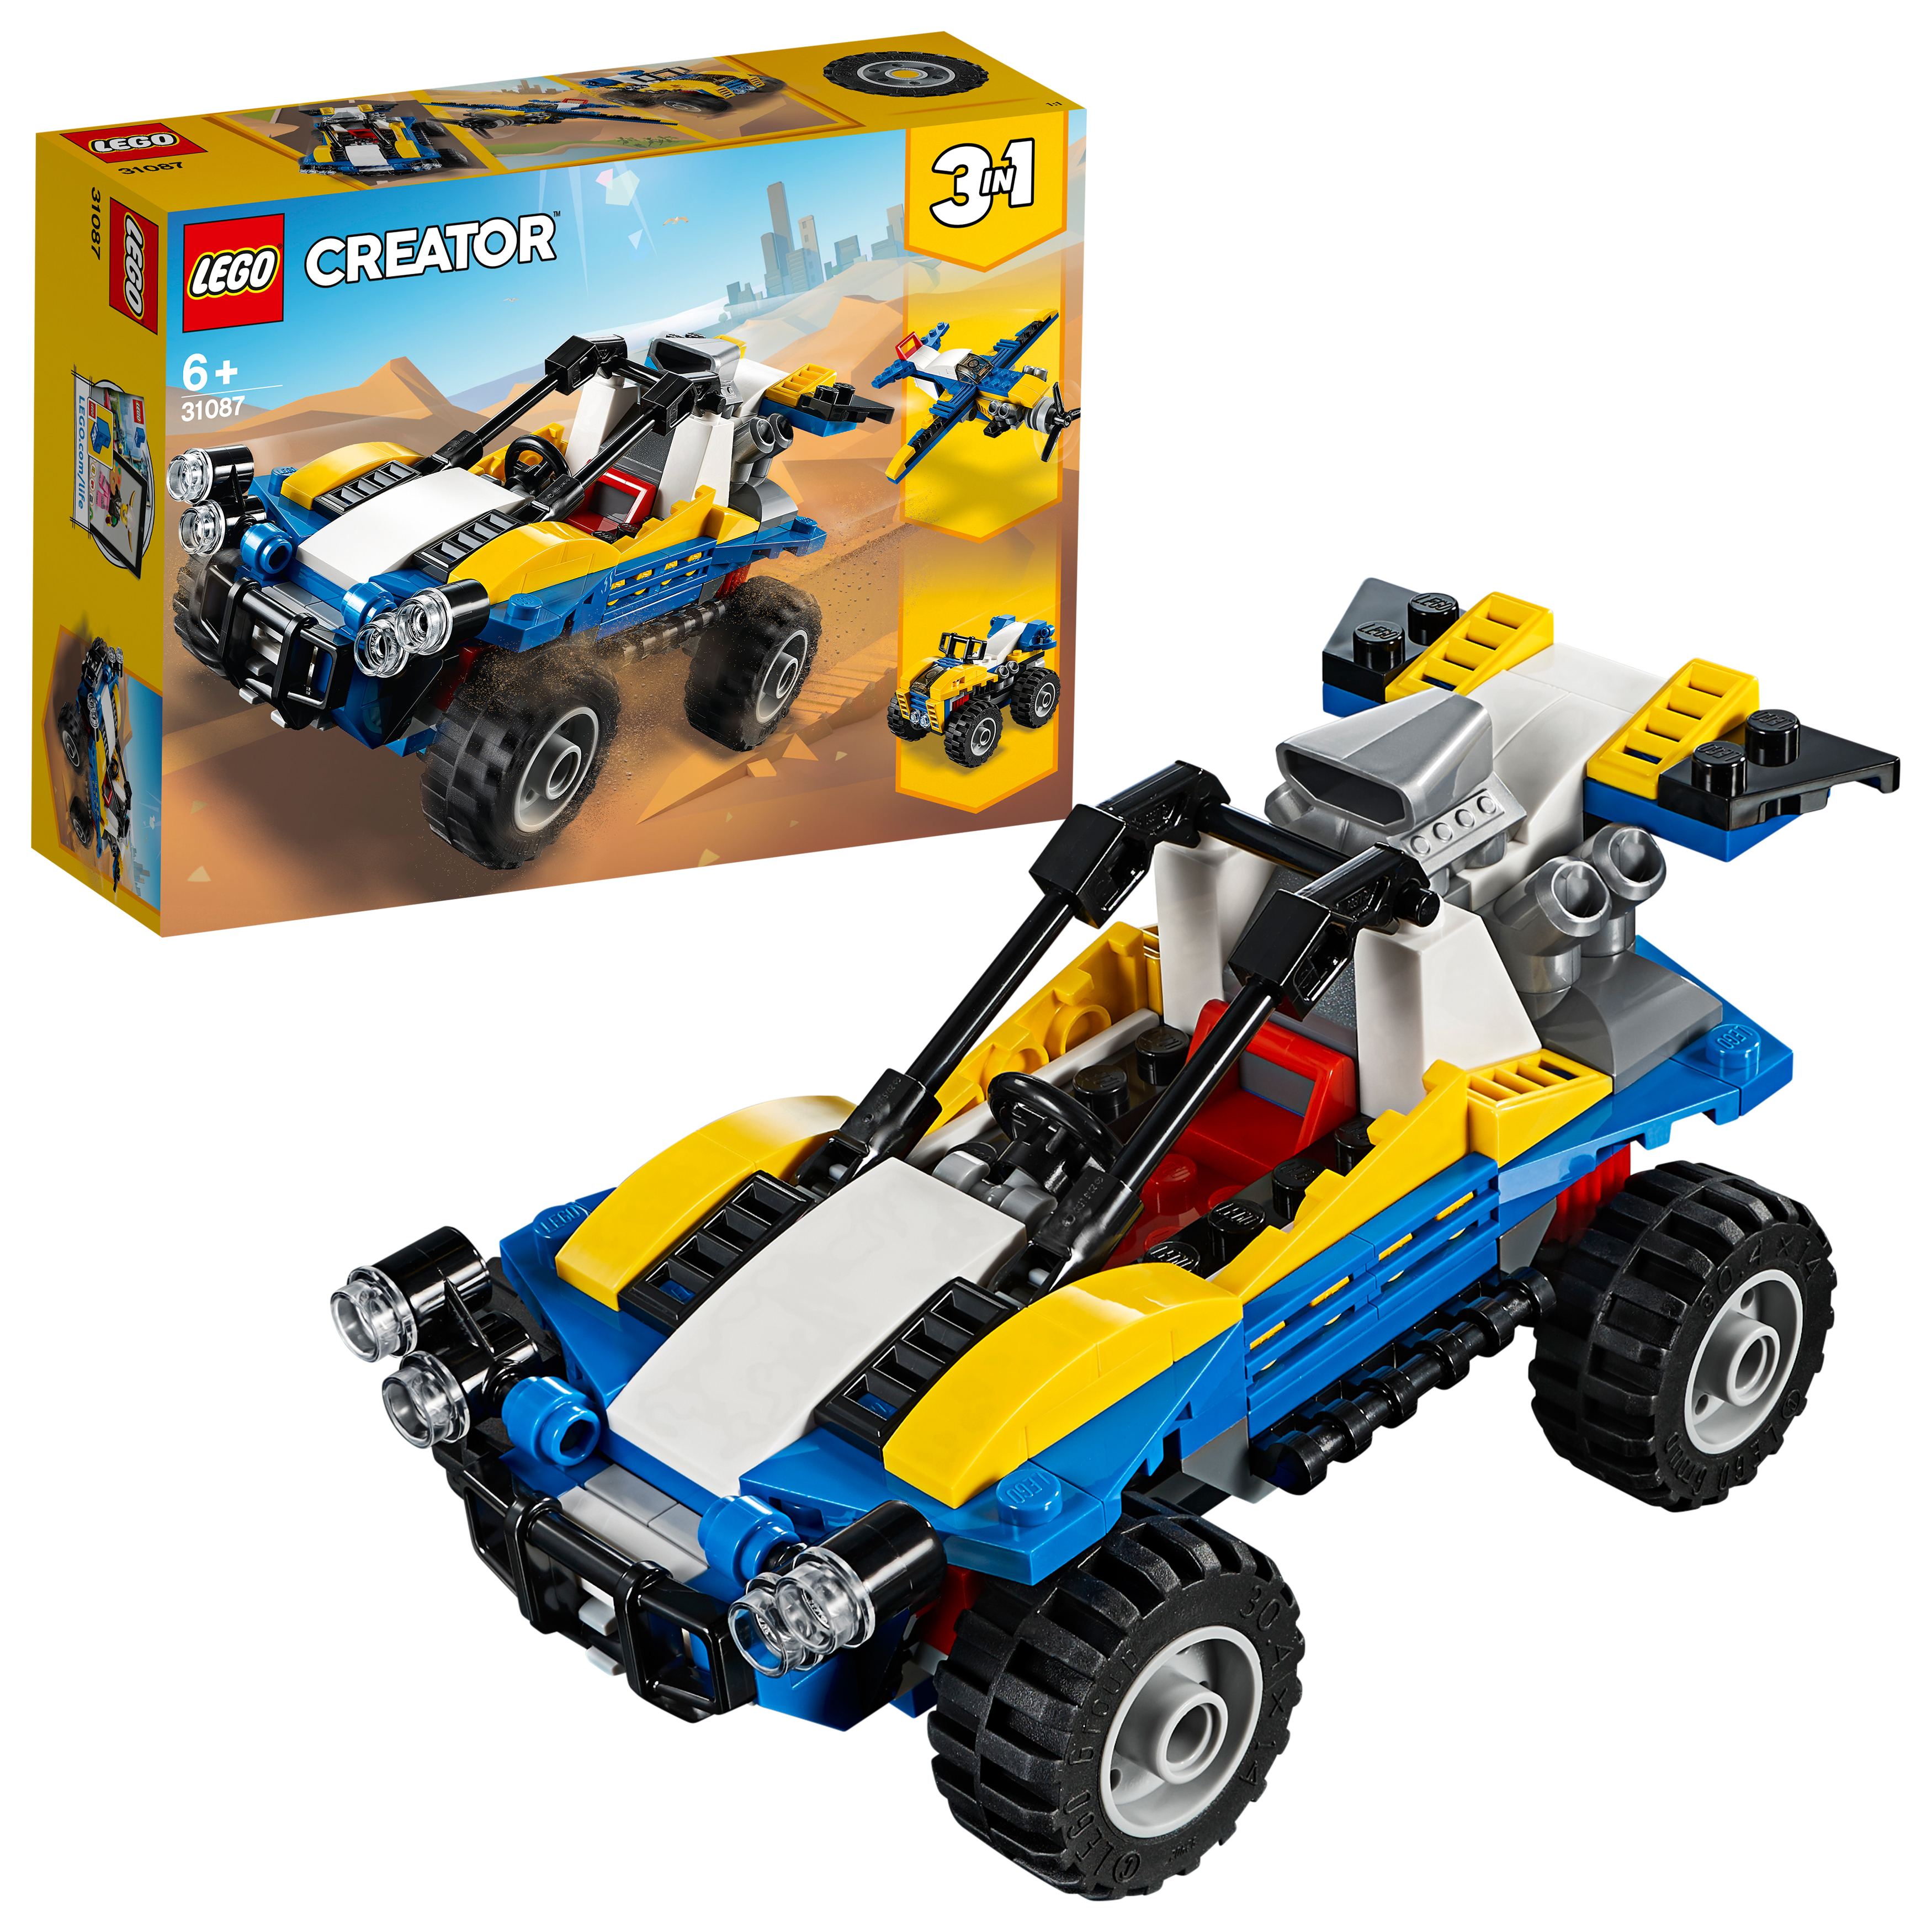 LEGO Creator - Strandbuggy (31087)